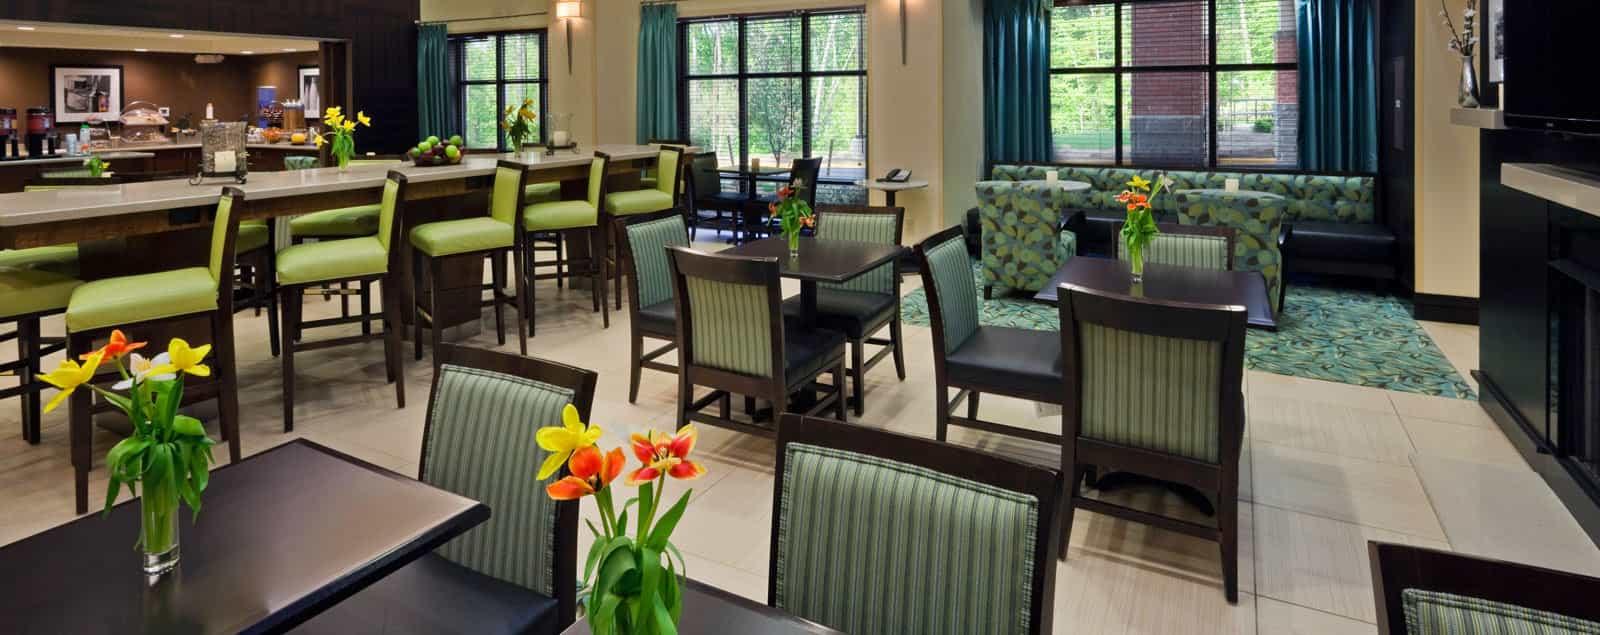 Mason Neck And Mount Vernon Hotels